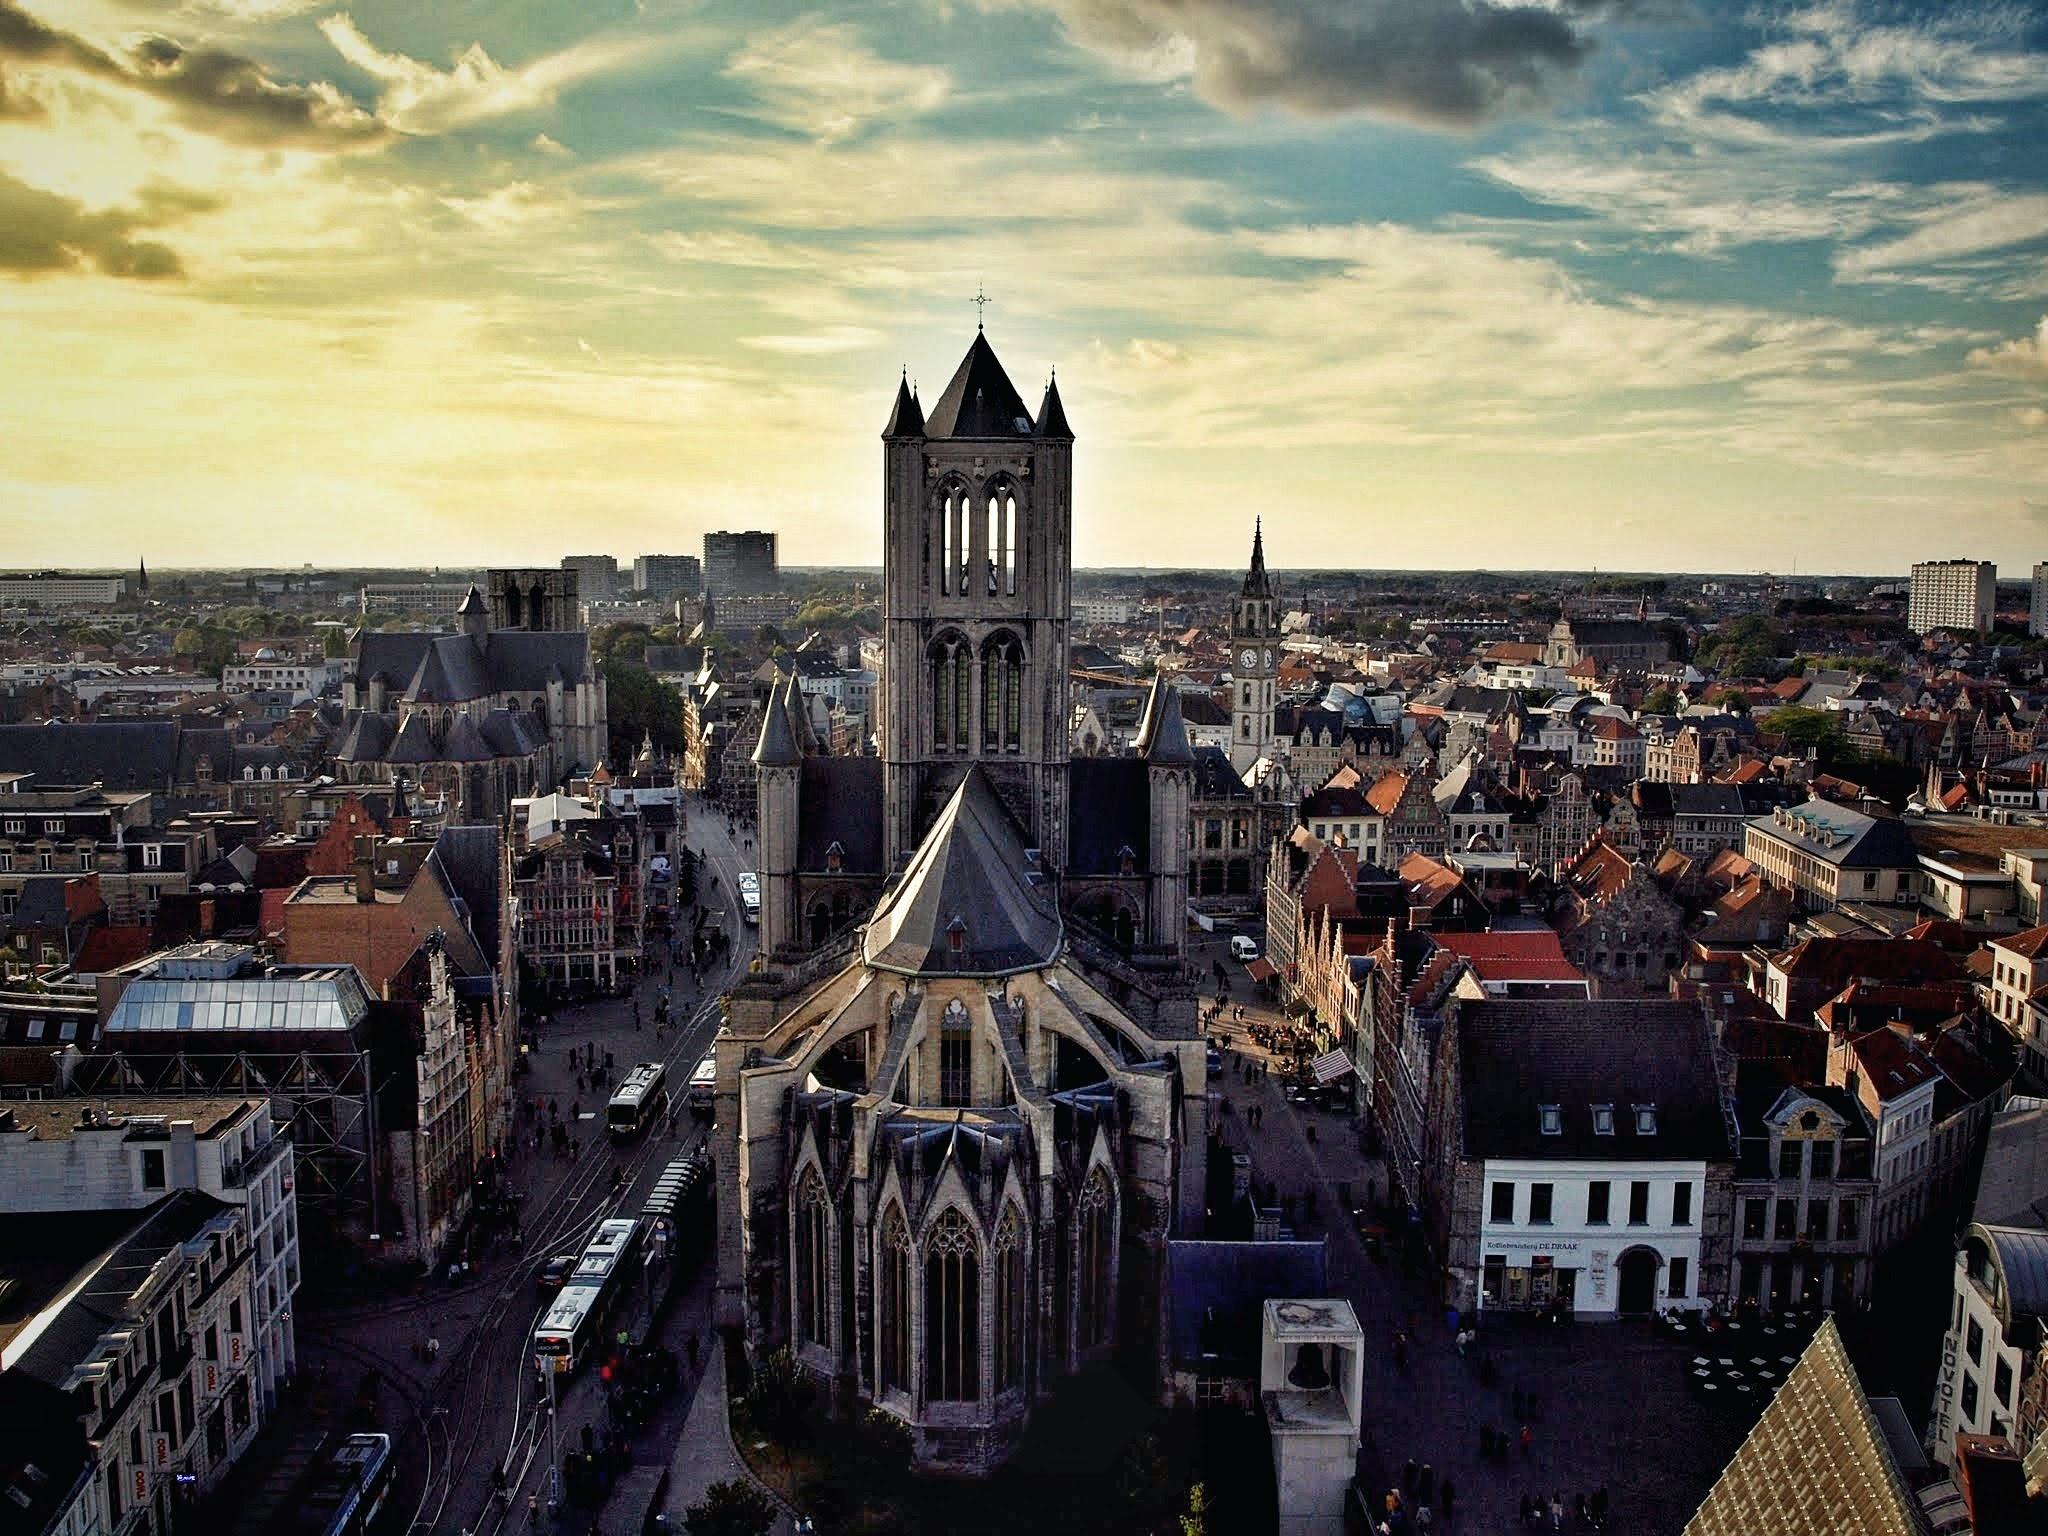 Torre-Berfort203-01 4 días en Gante y Brujas. Día 2: Free tour por Gante Free Tours Viajes